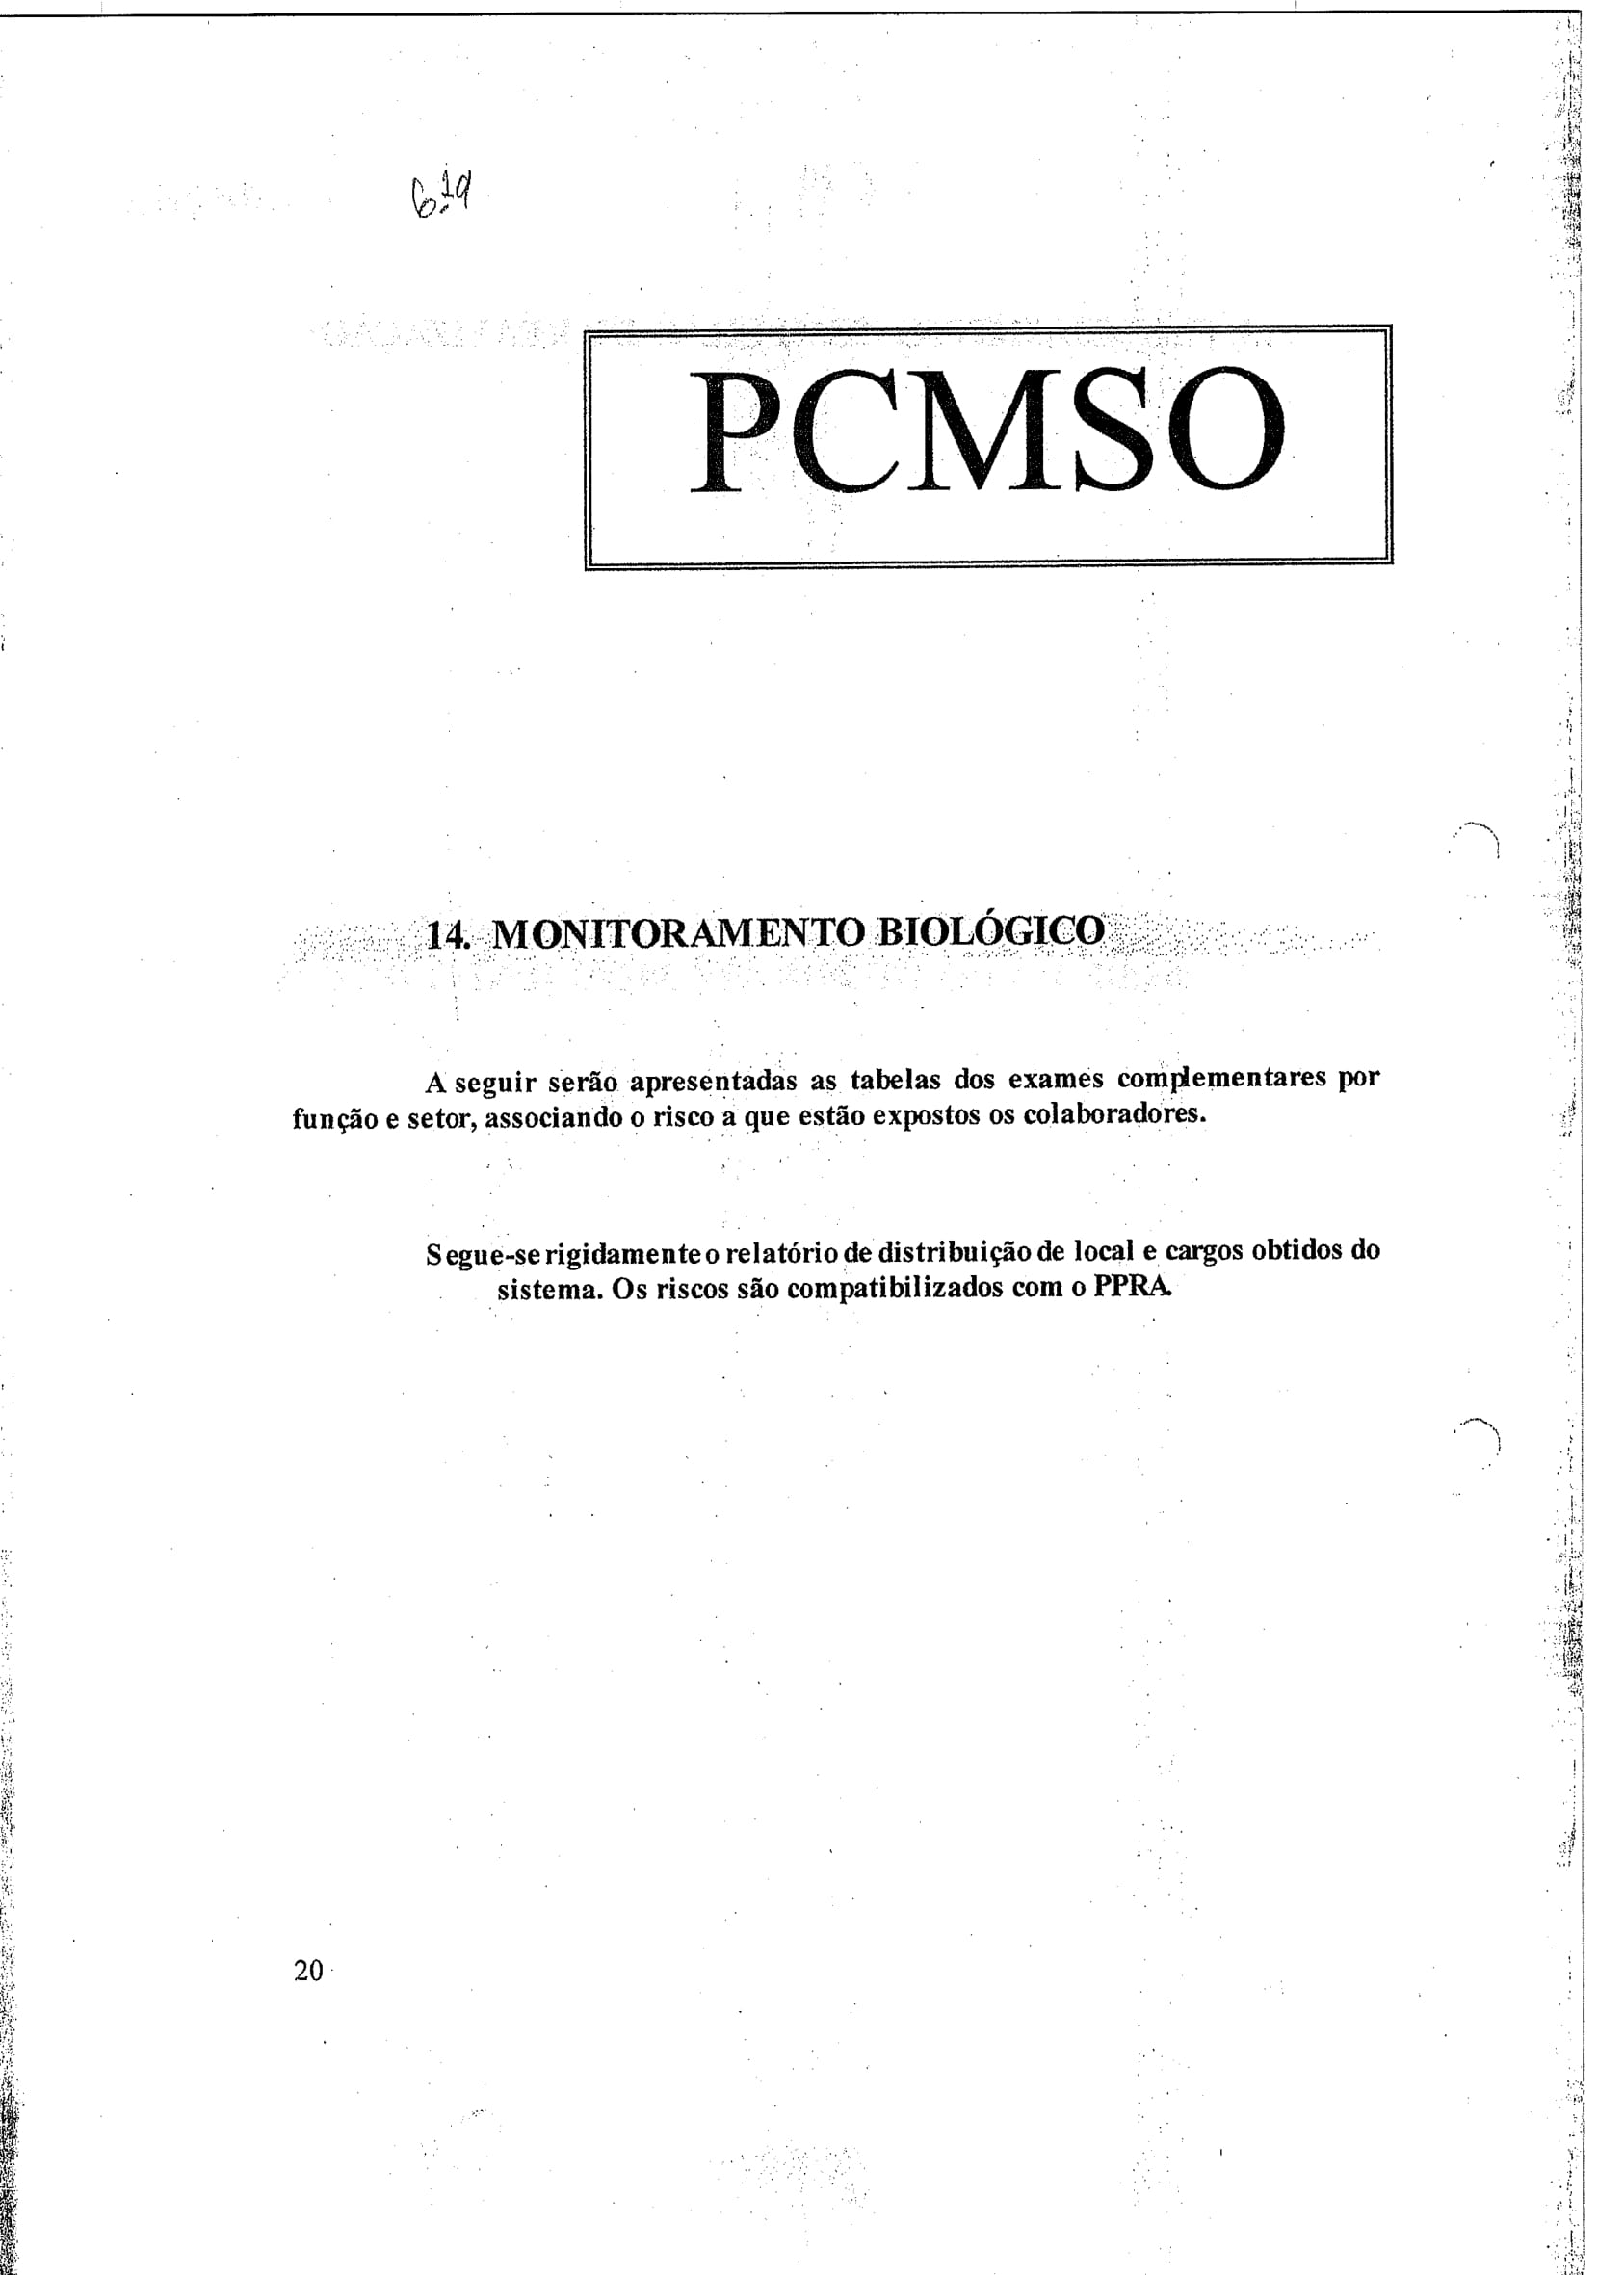 PL001222019-098